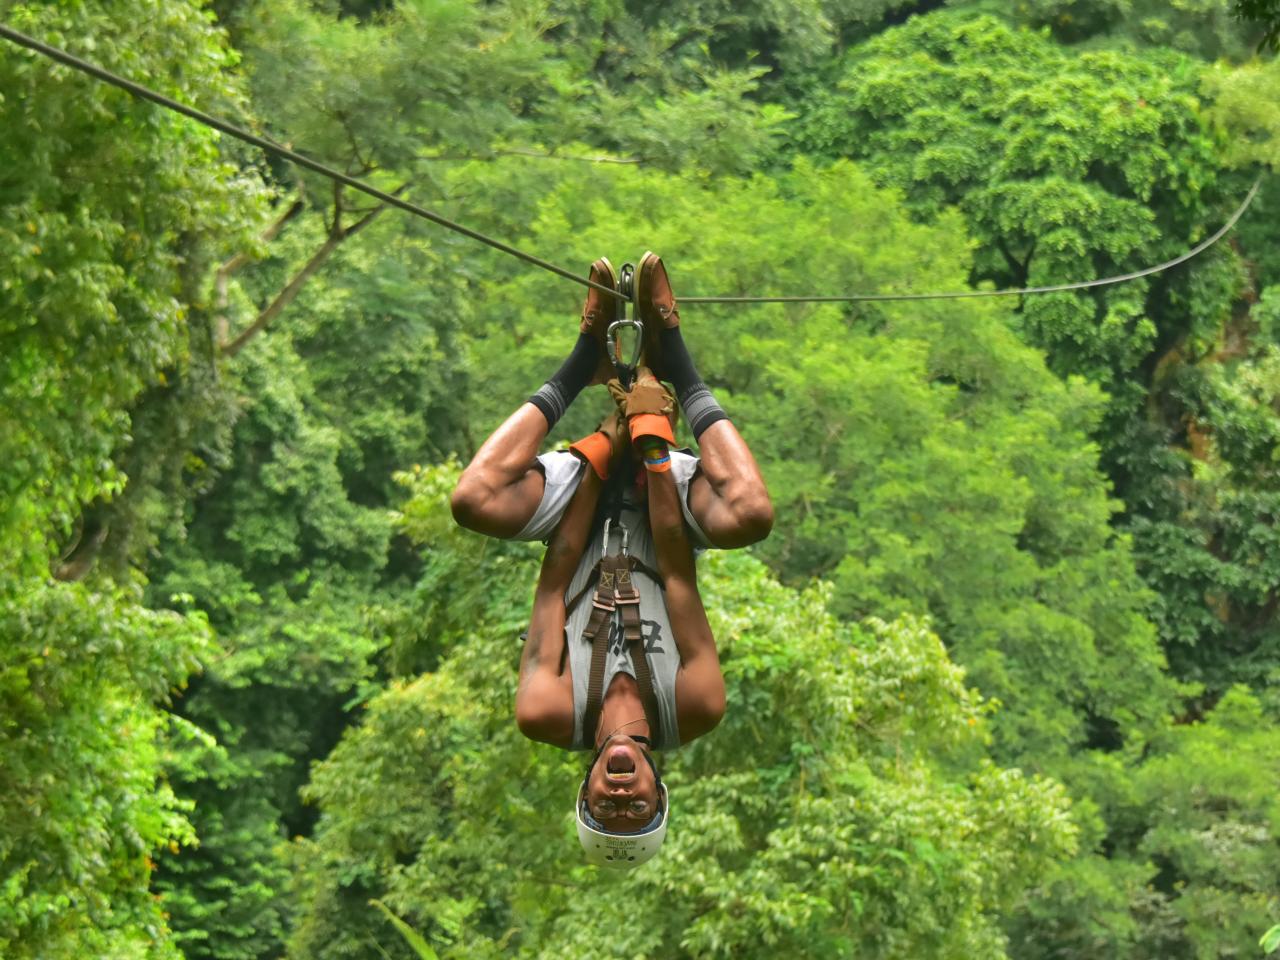 Zip Line Canopy Tour